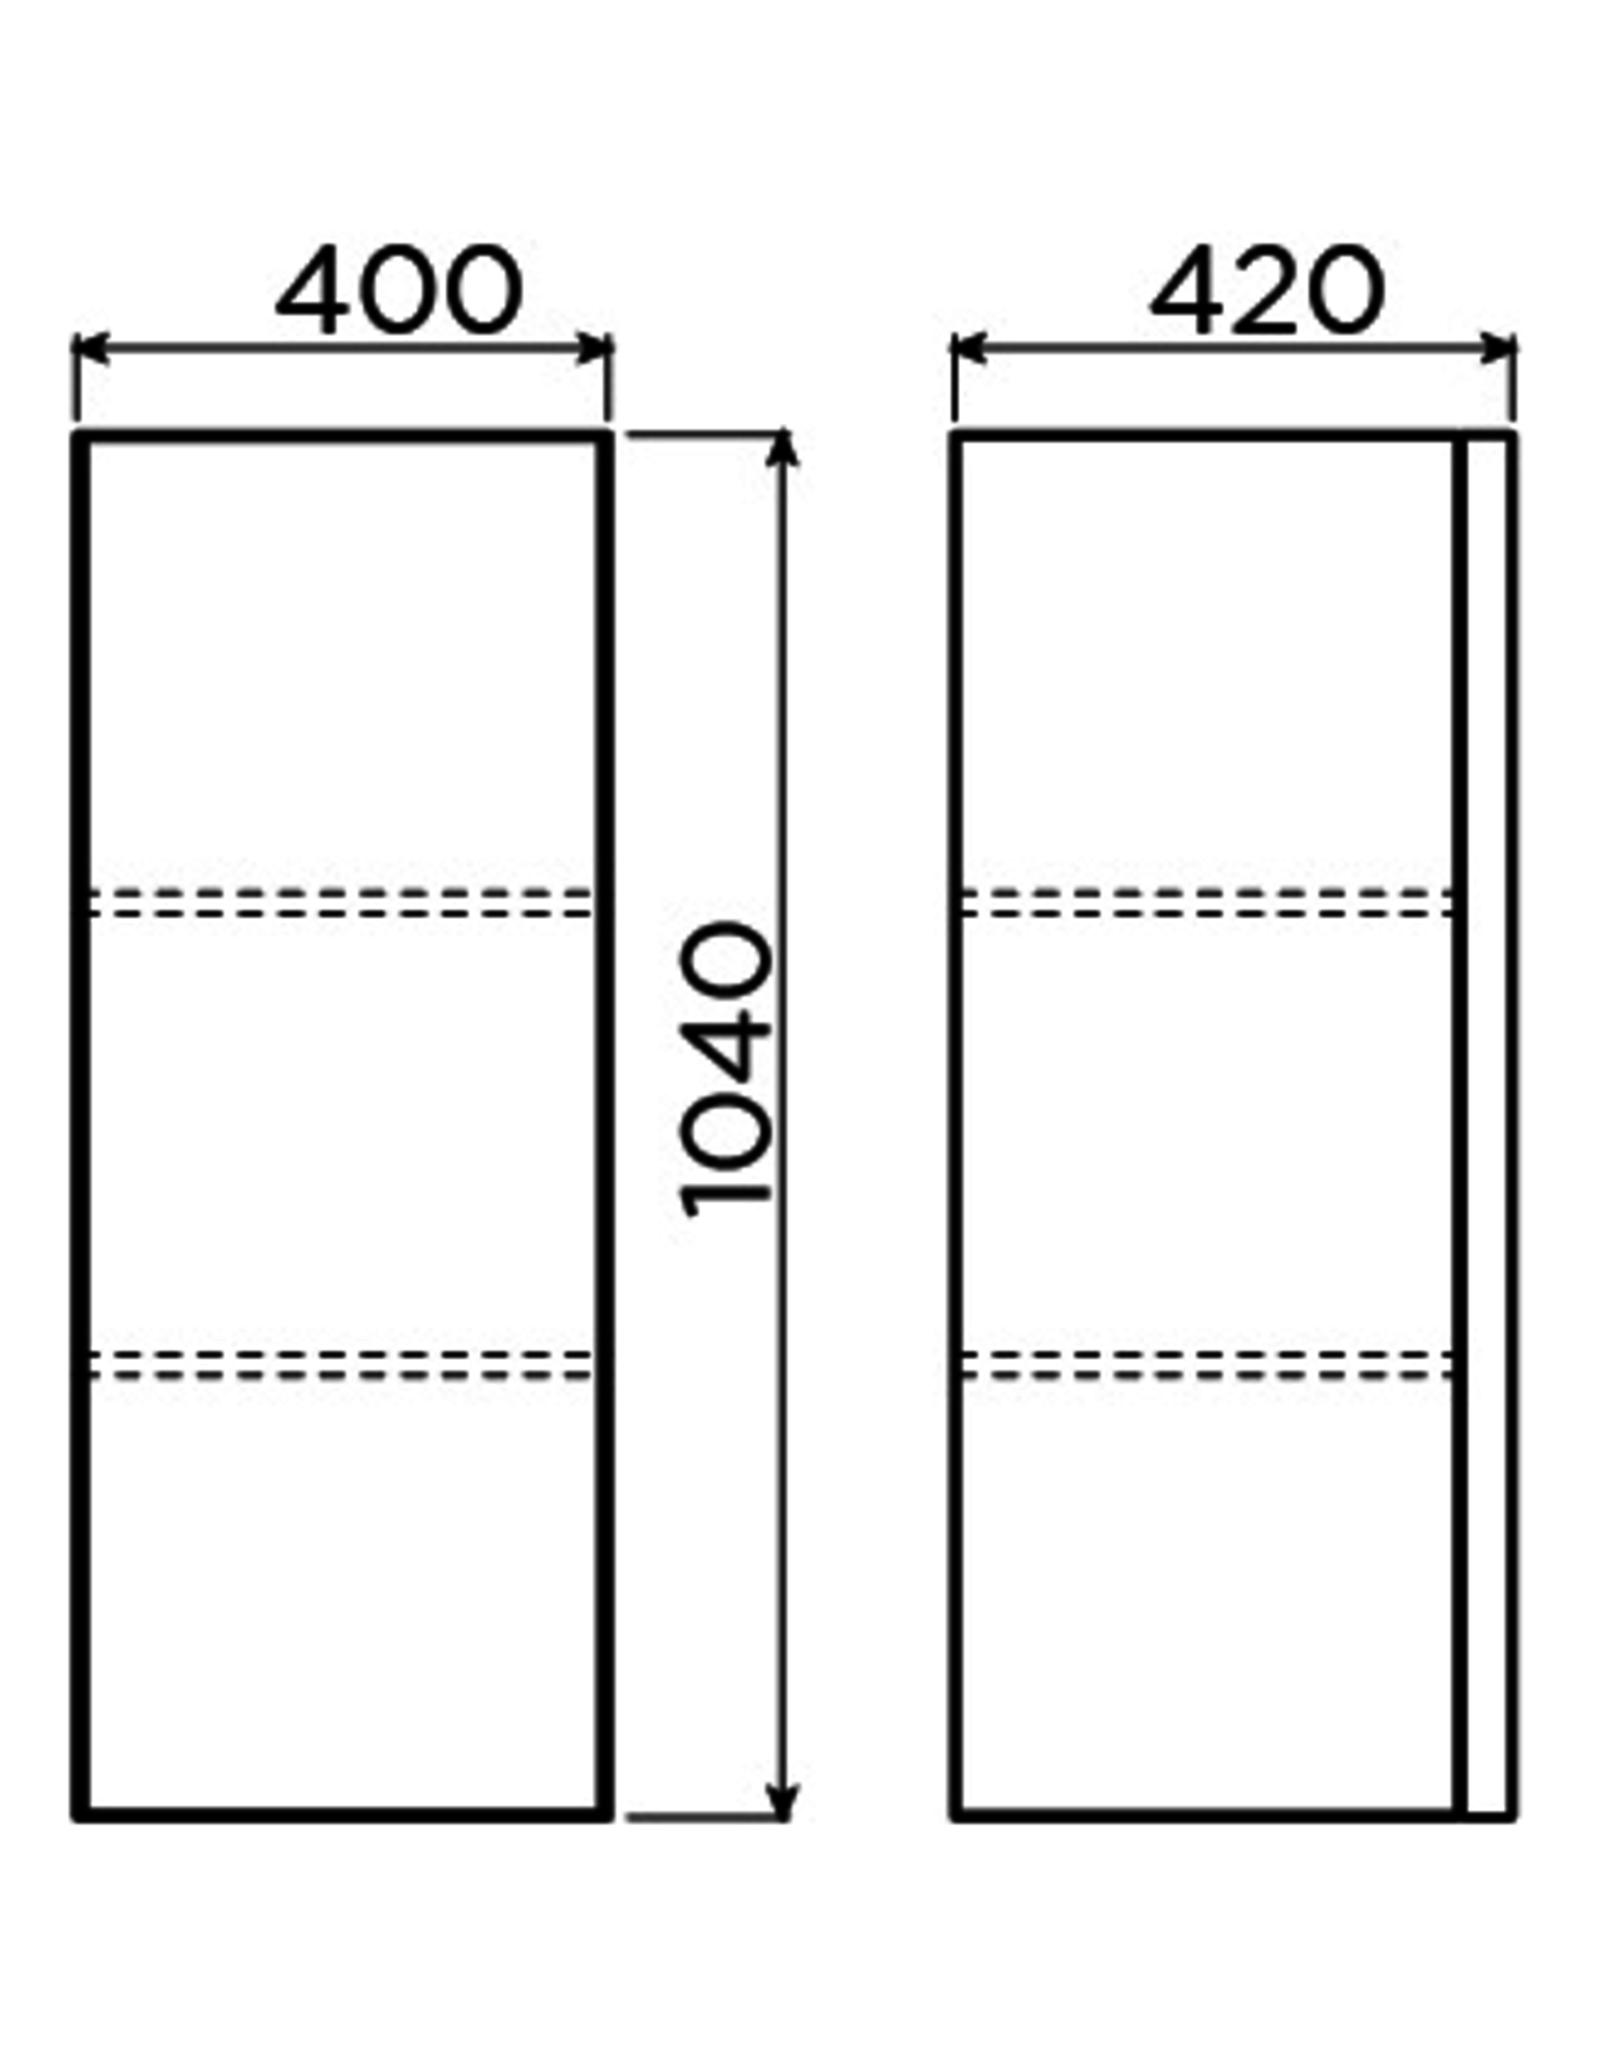 Match Me kolomkast 104 cm - uitverkoop